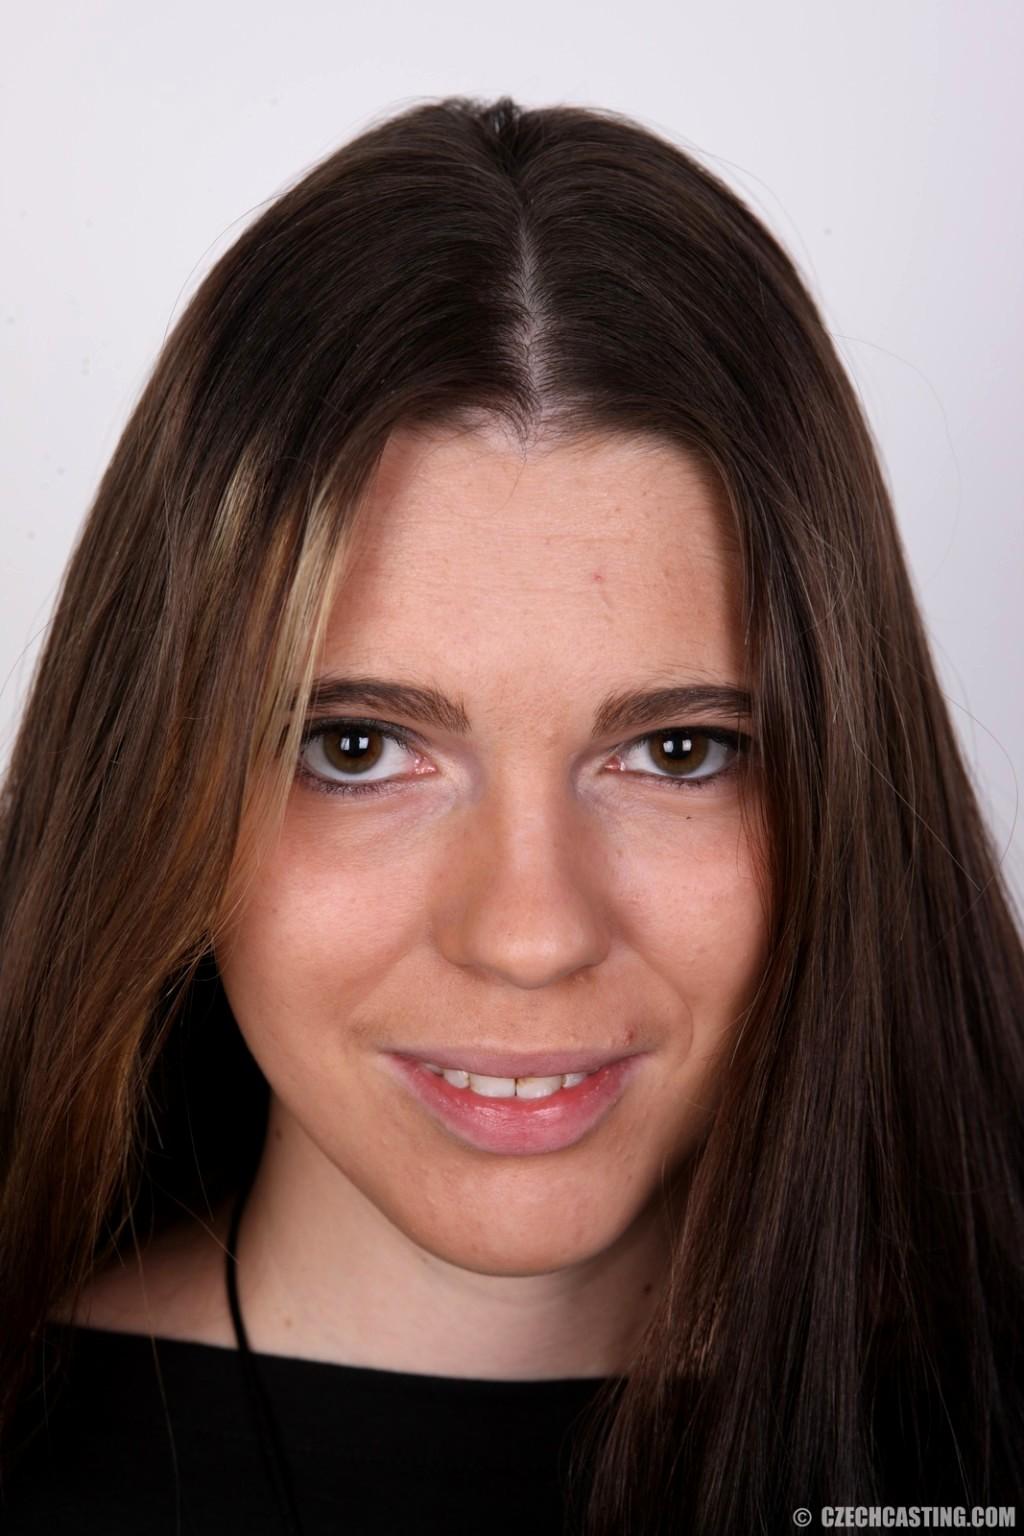 Czech Casting Czechcasting Model Completely Free Big Tits